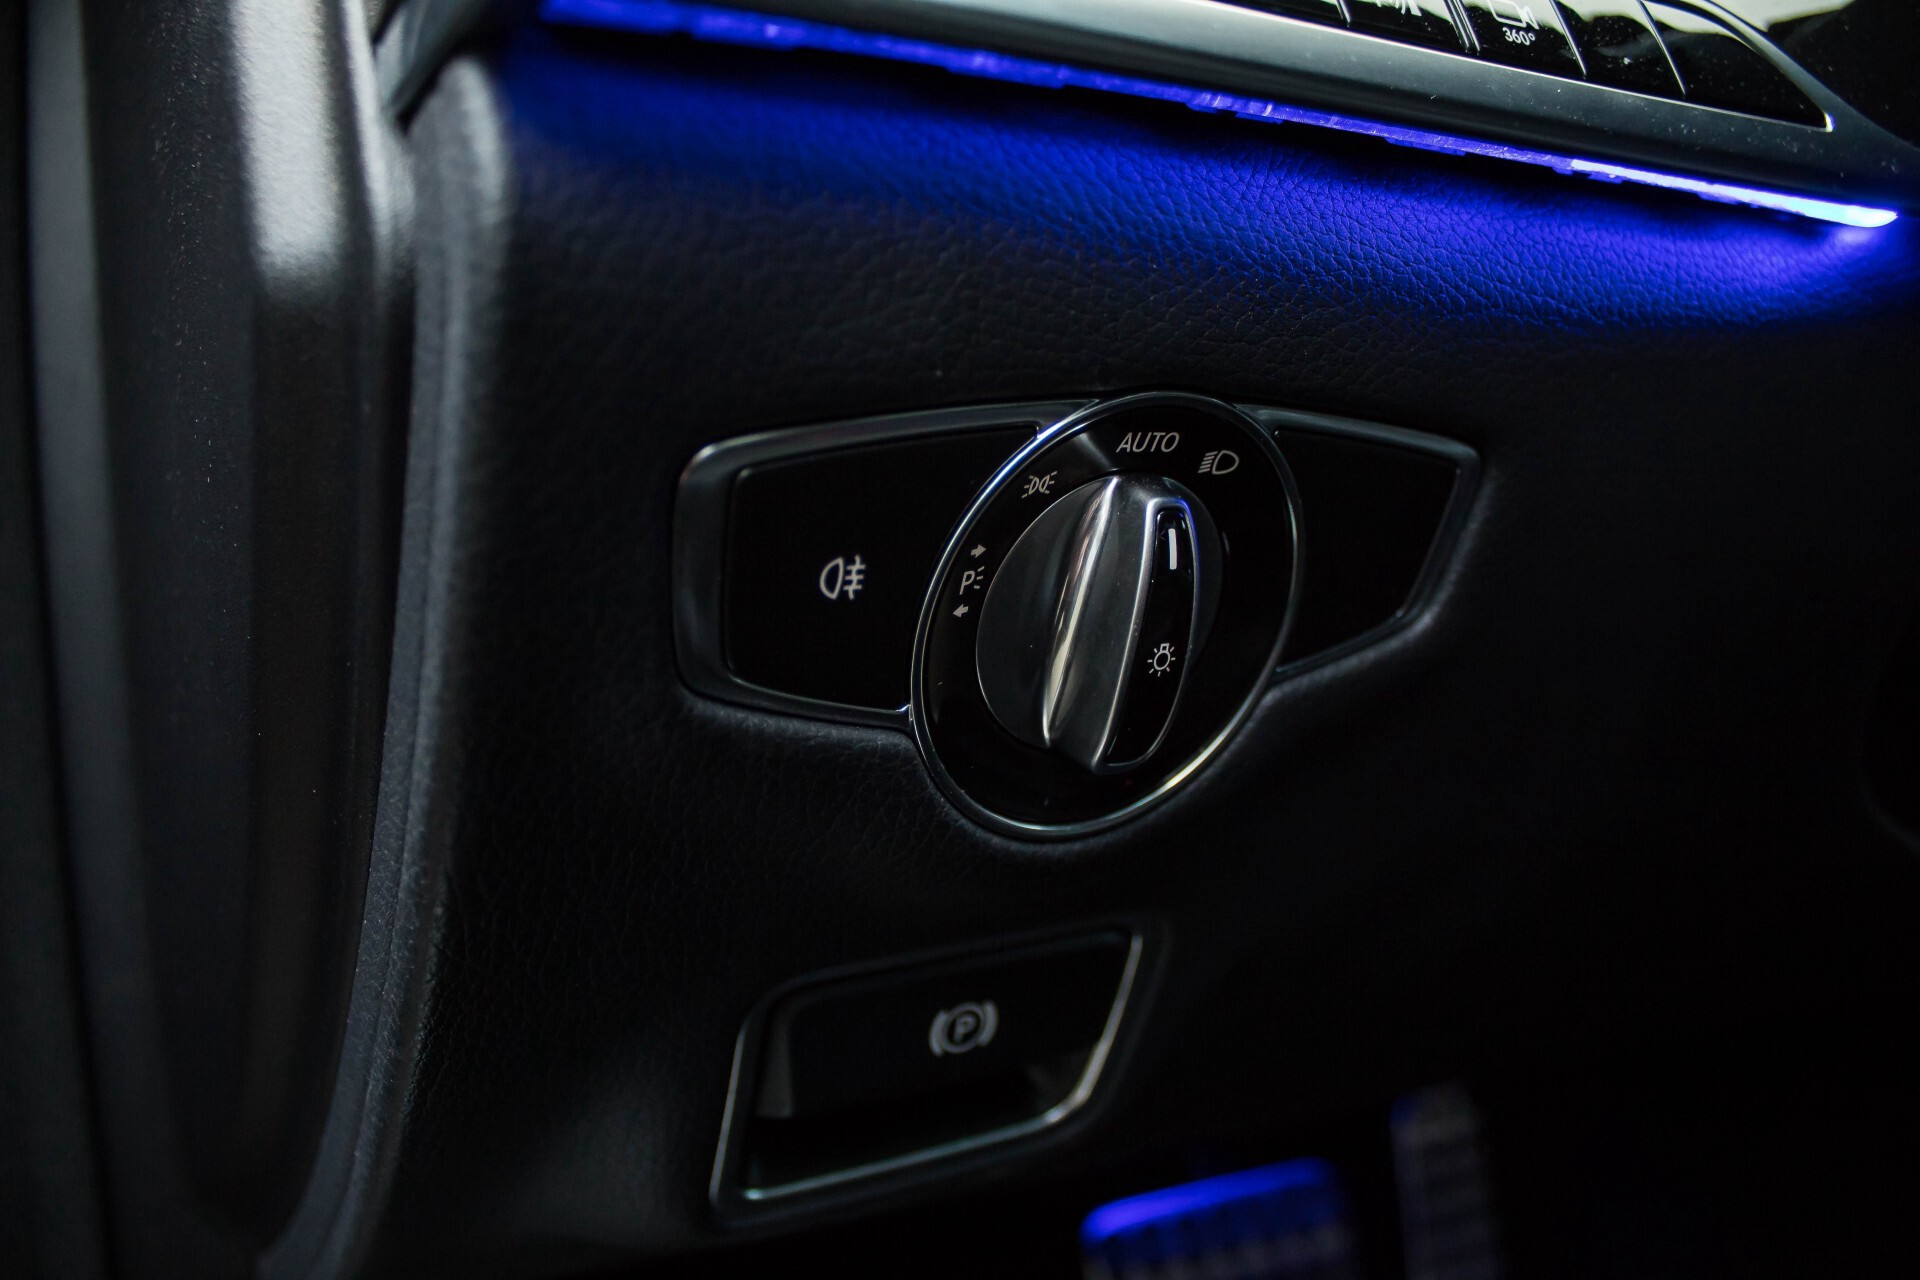 Mercedes-Benz S-Klasse 350 BlueTEC 63 AMG Panorama/Distronic/Keyless/Massage/Burmester Aut7 Foto 24